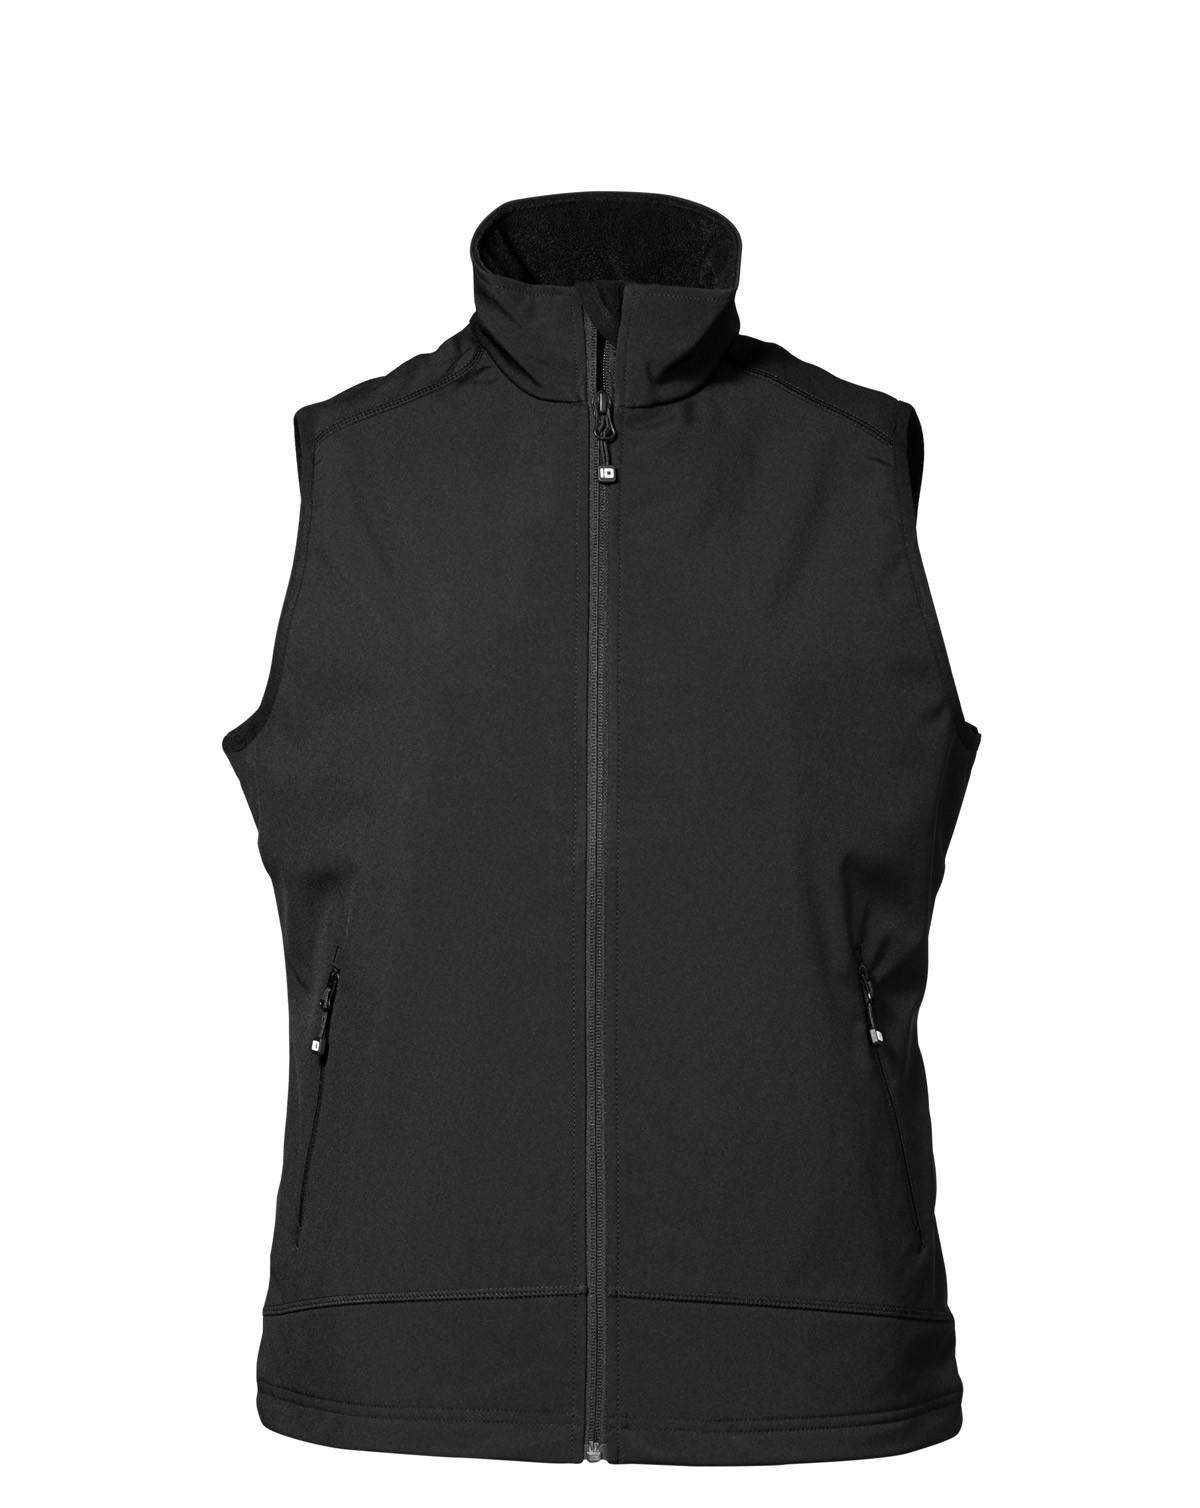 Image of   ID Dame Softshell Vest (Sort, XL)